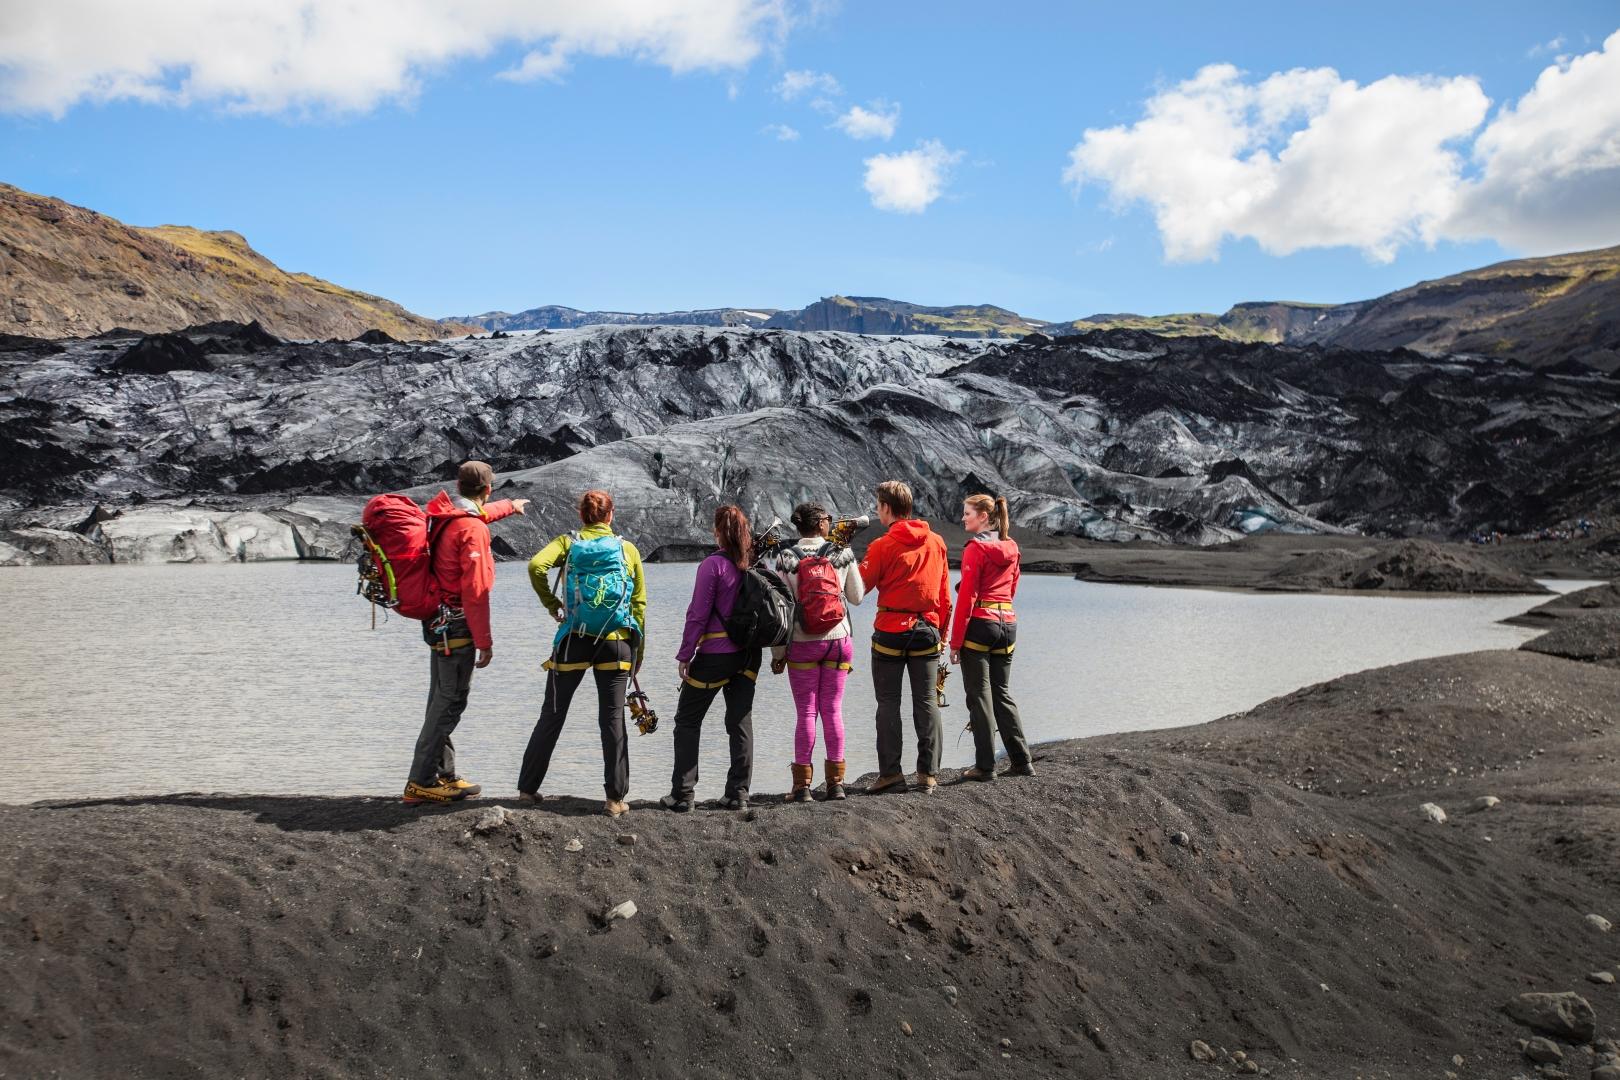 By the terminus of Sólheimajökull glacier